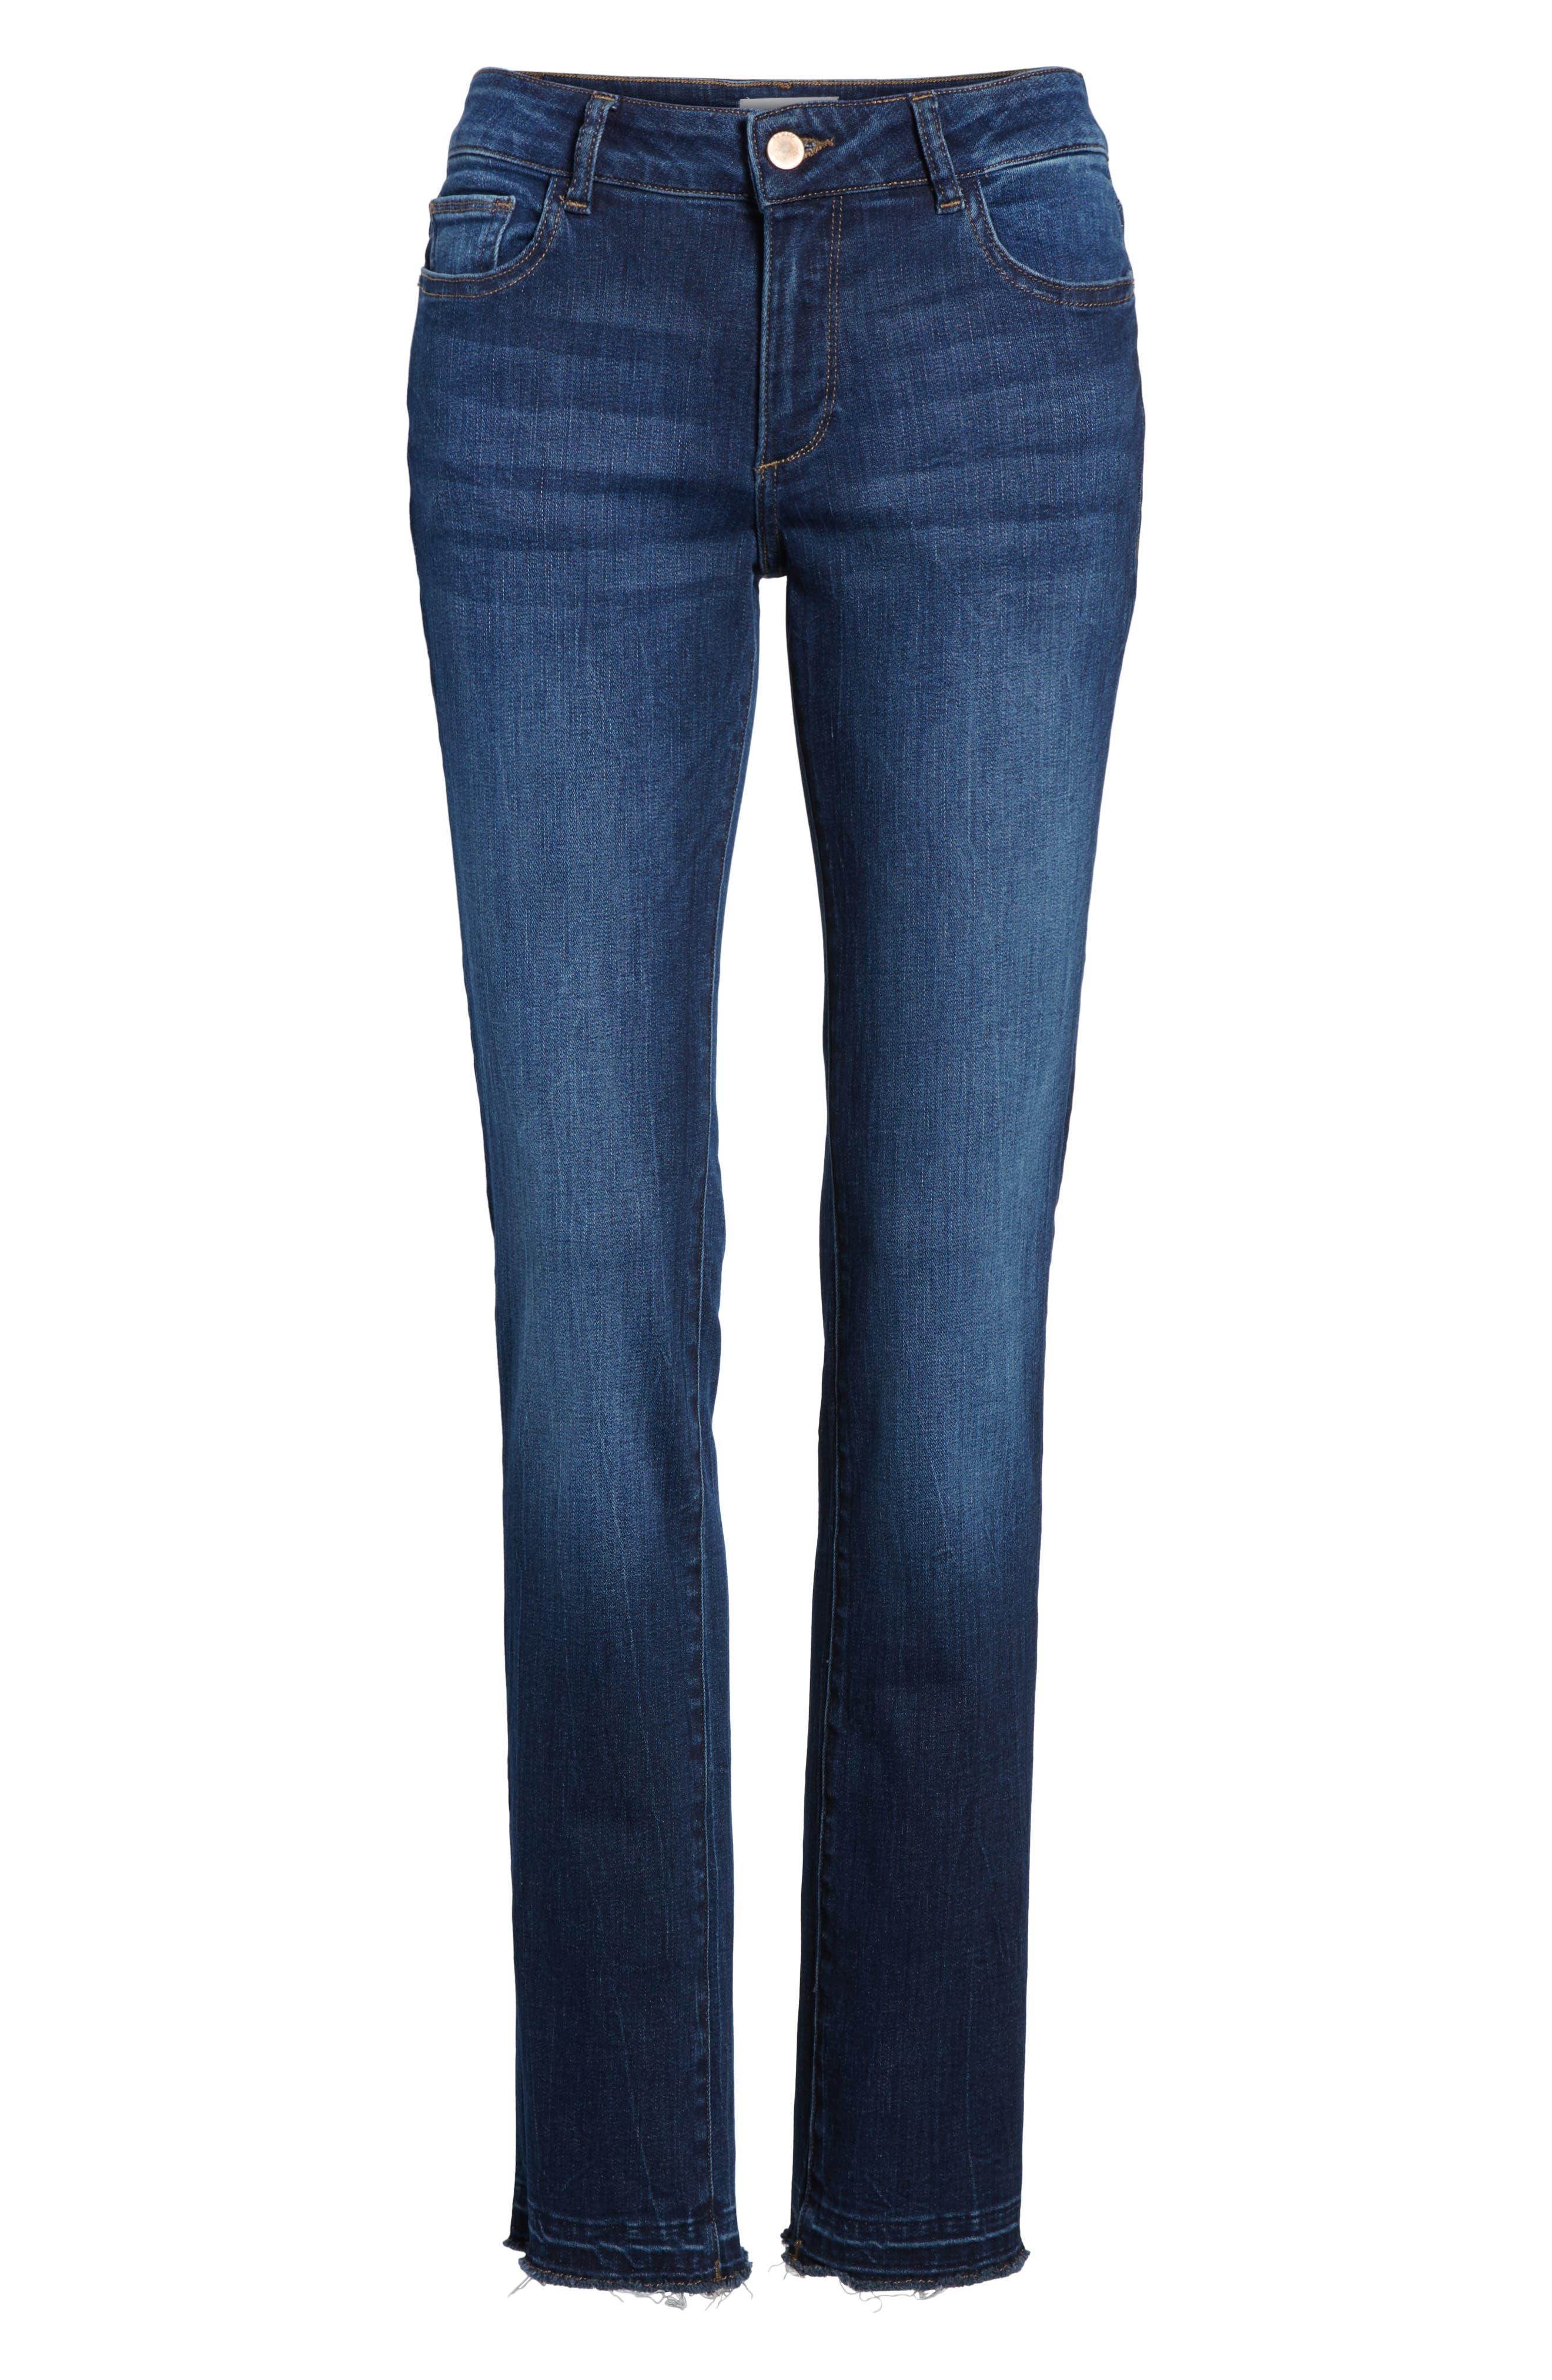 Coco Curvy Slim Straight Leg Jeans,                             Alternate thumbnail 7, color,